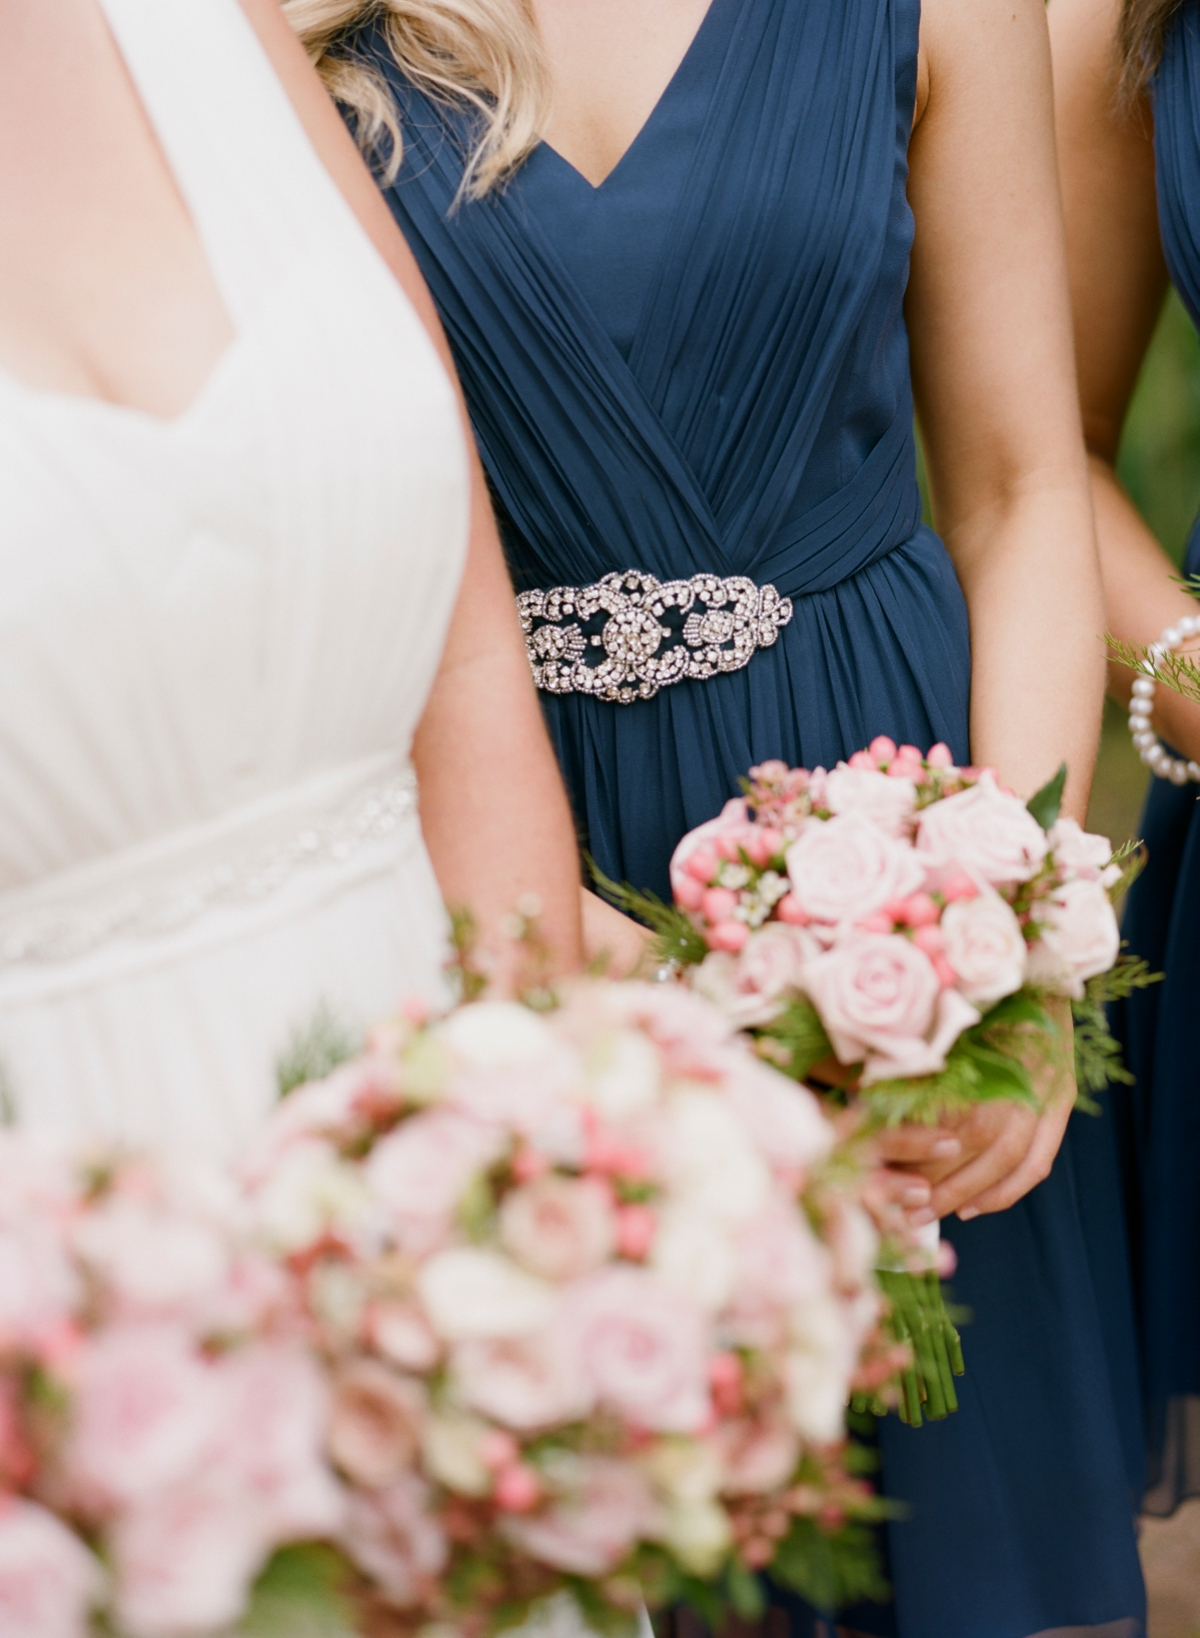 Monterose berry farm wedding by Mr Edwards Photography_0723.jpg